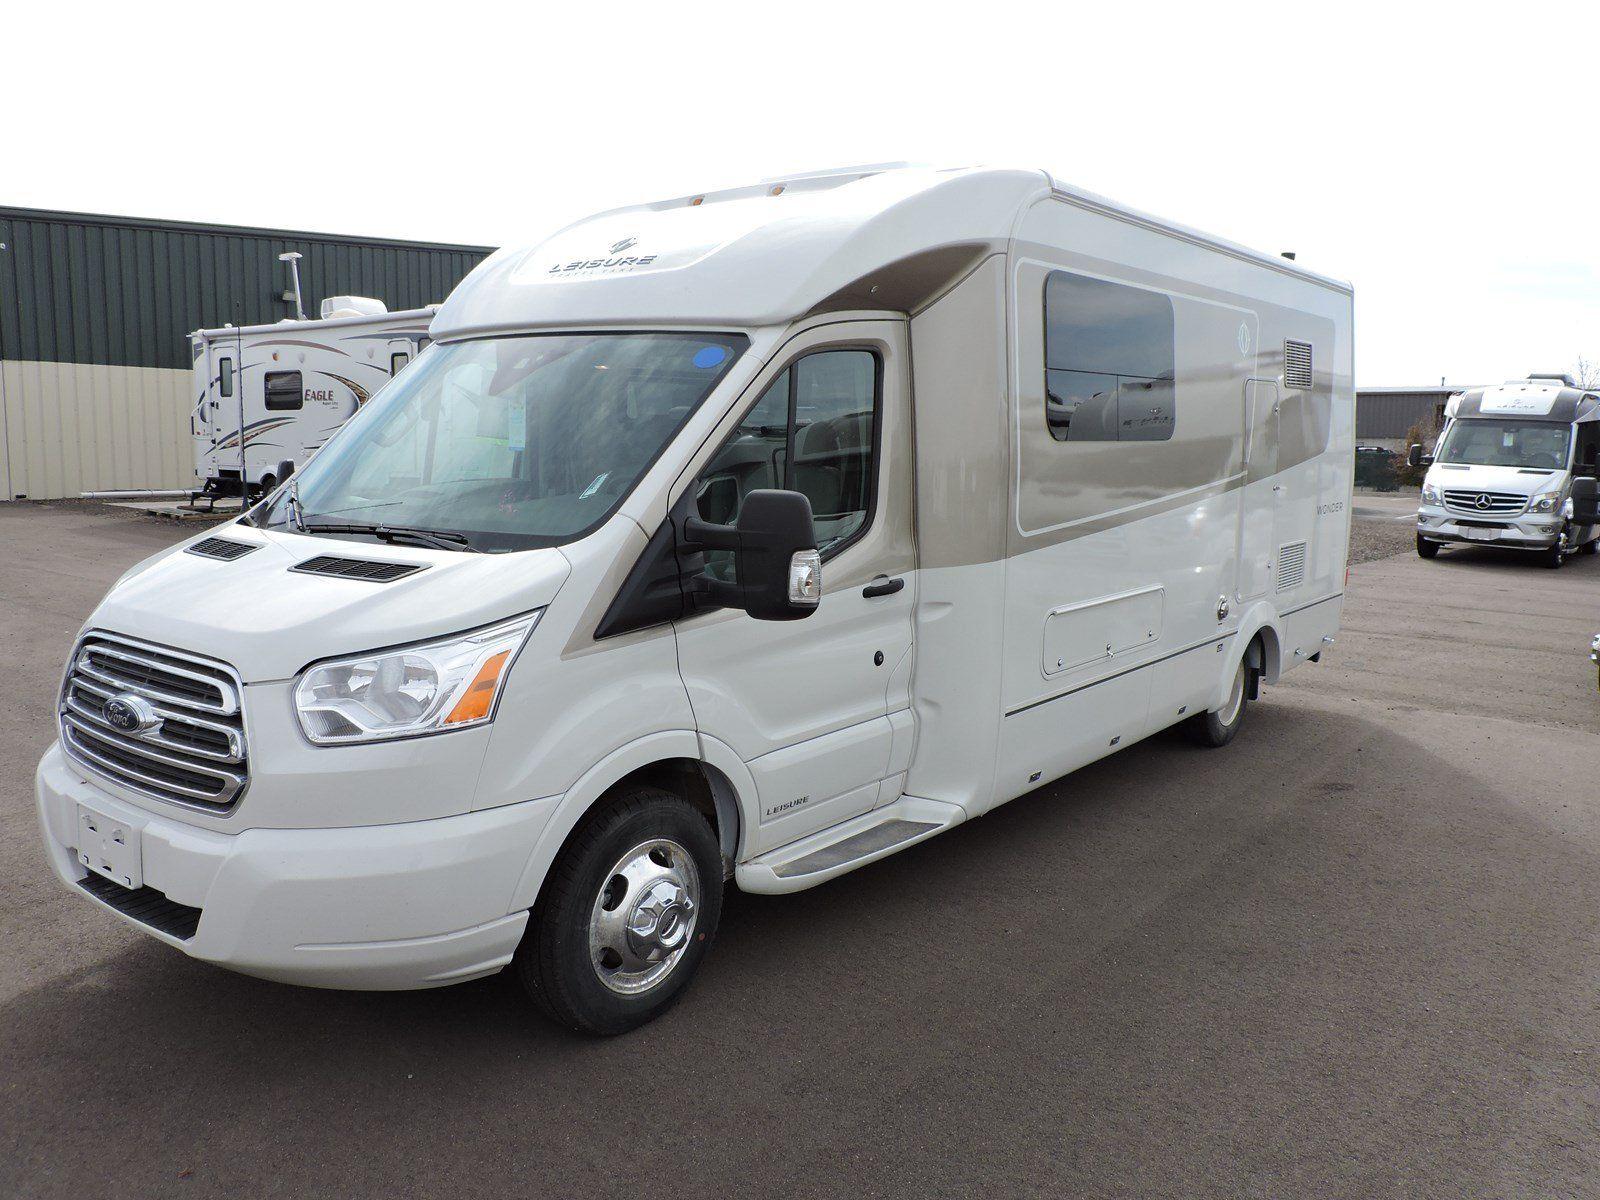 2019 Leisure Travel Vans Wonder W24ftb Colo Springs Co 2531 New Used Rvs For Sale In Las Vegas Nv Roadtrek Leisure Travel Vans Dynamax And More